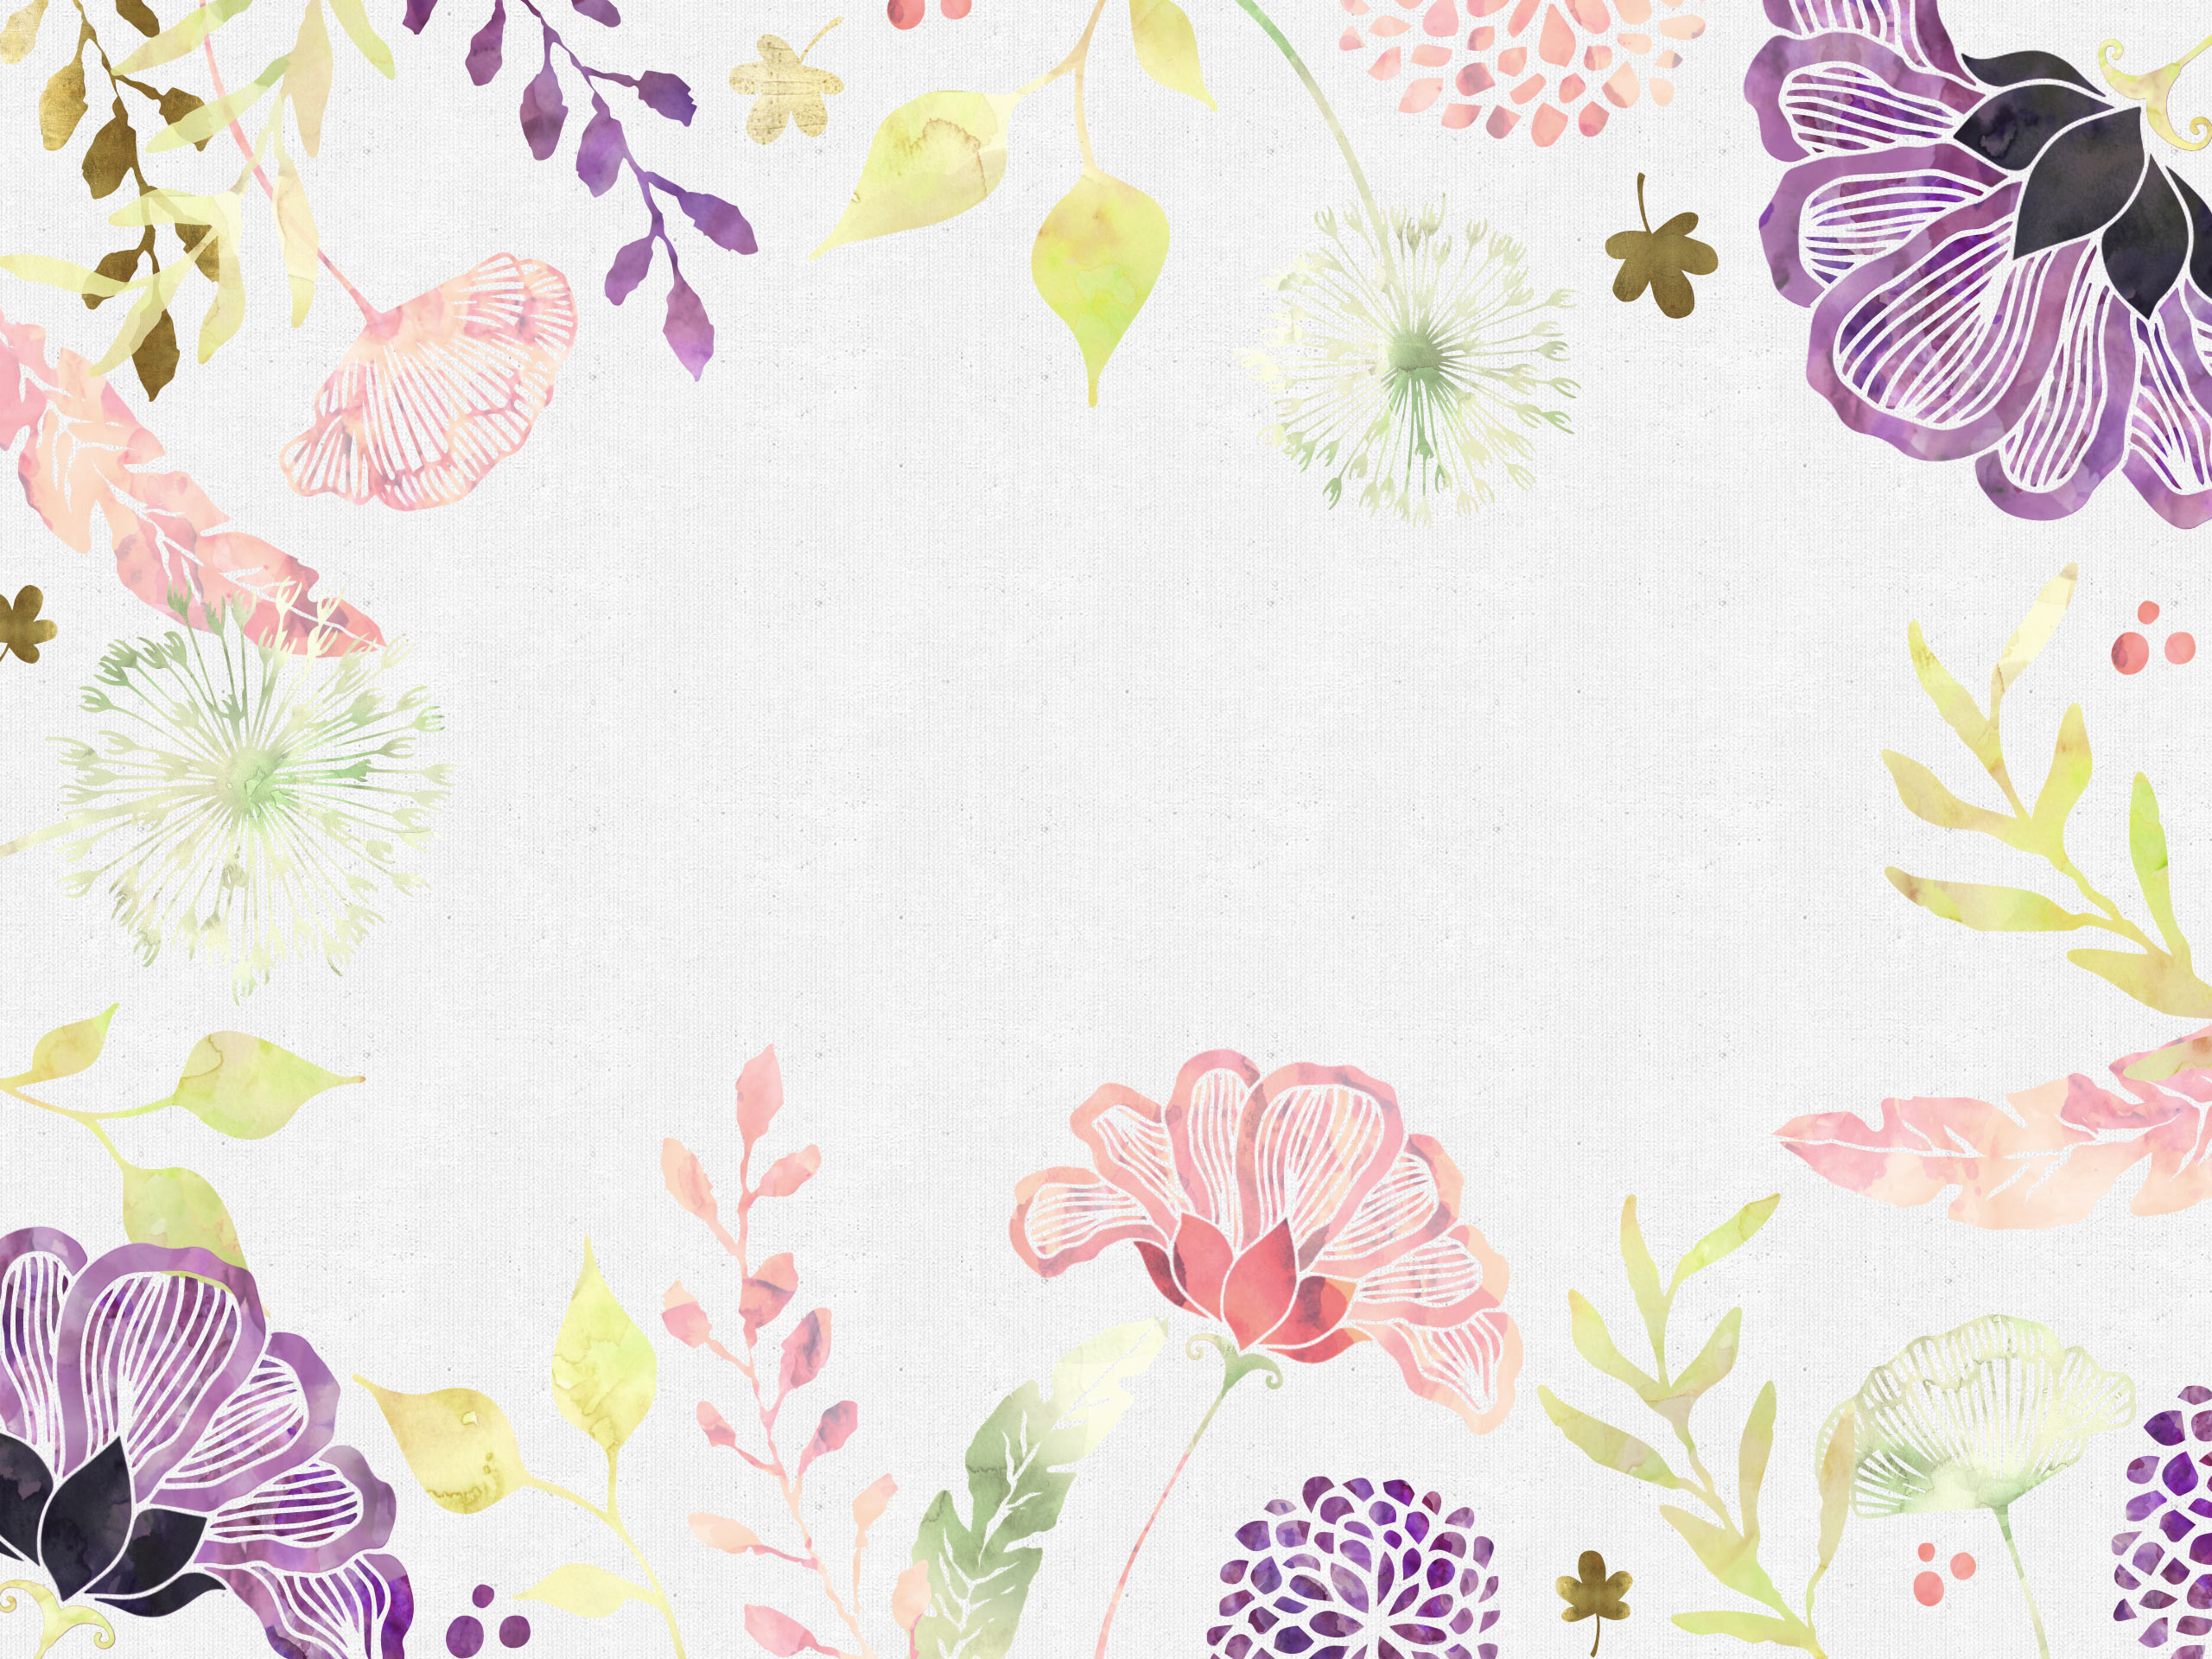 2560x1920, Free Floral Desktop Wallpaper I Choose Happiness - Floral Wallpaper Desktop - HD Wallpaper